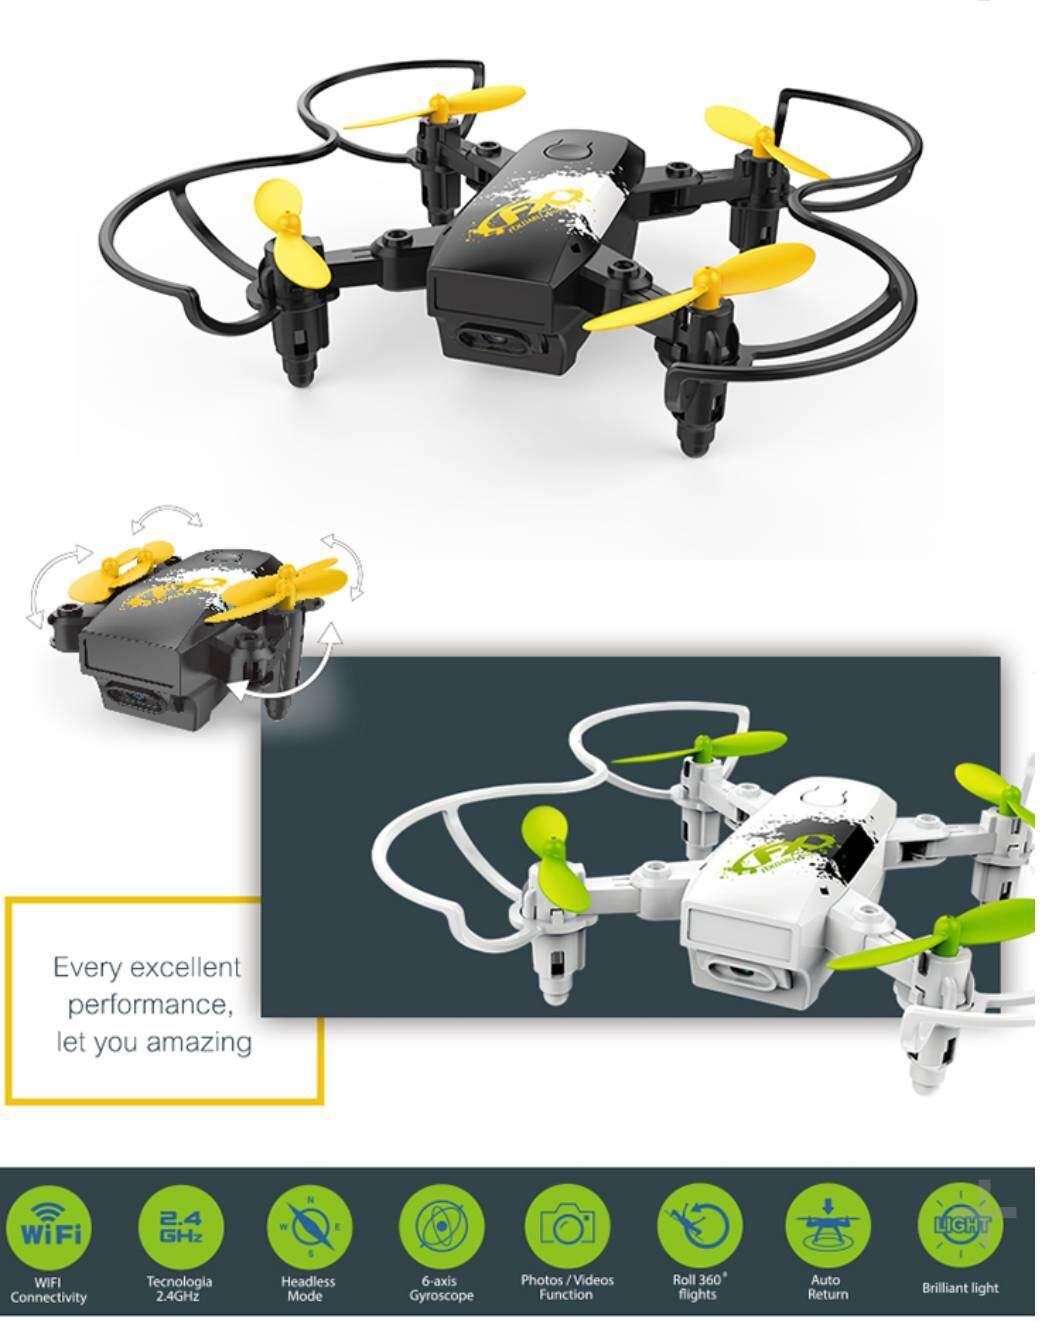 Drone Mini Lh-X30 โดรนจิ๋วพับได้พร้อม ระบบล๊อคความสูง.